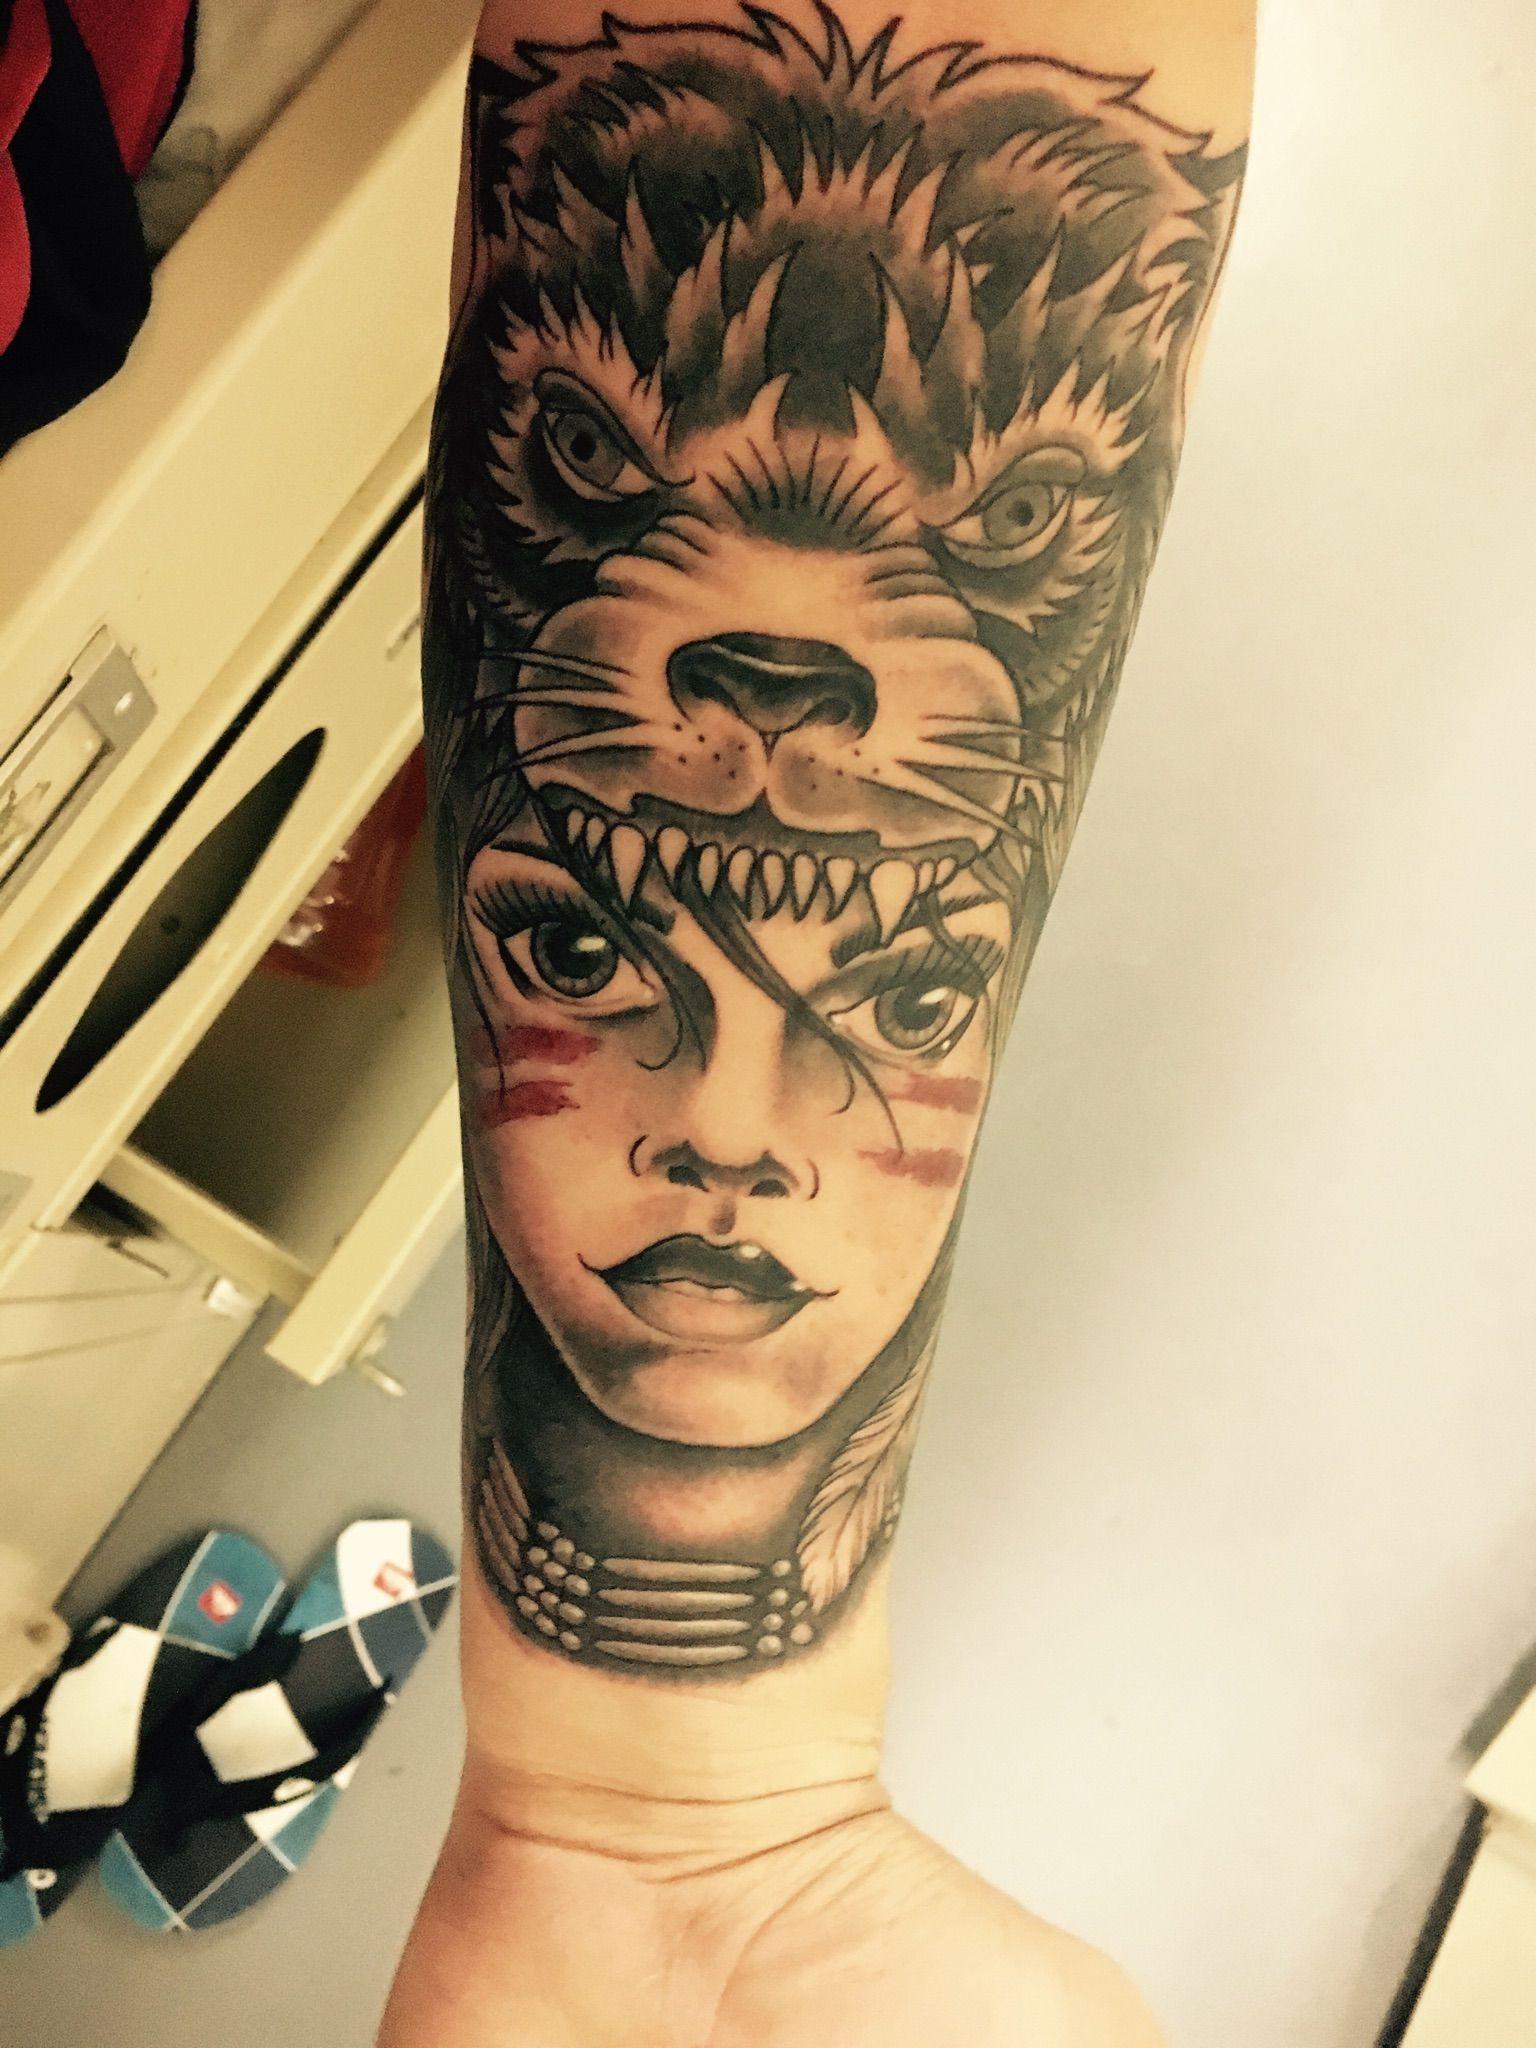 Traditional Wolf Headdress By Paul Lovio At Body Temple Oceanside Ca Wolf Headdress Tattoos Cool Tattoos